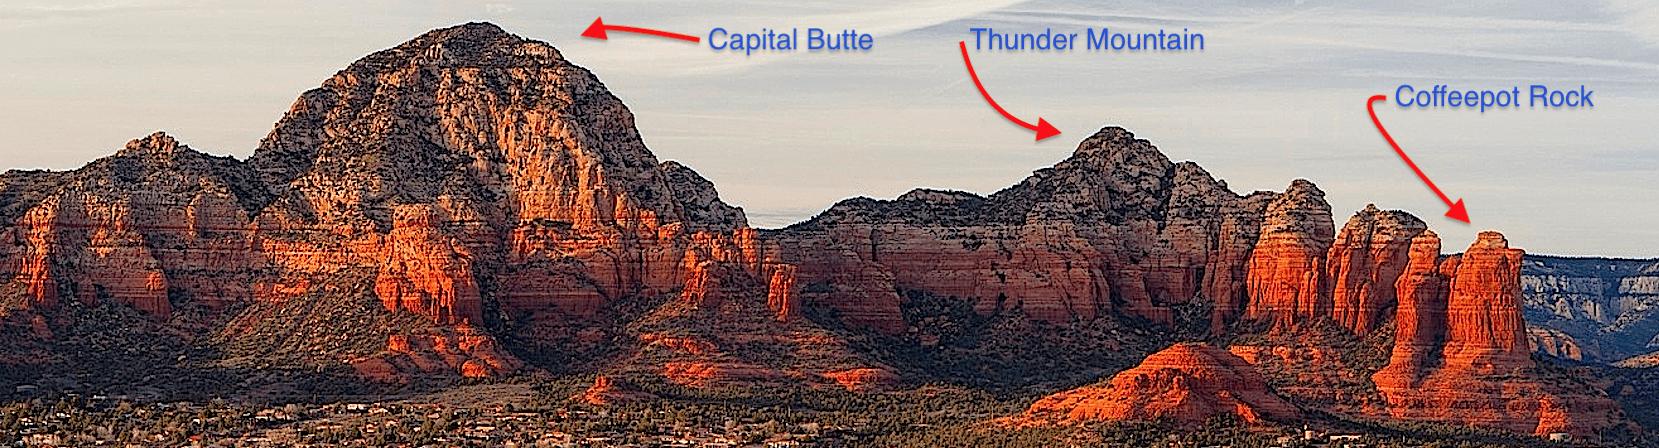 Capital butte-thunder Mtn-capital butte